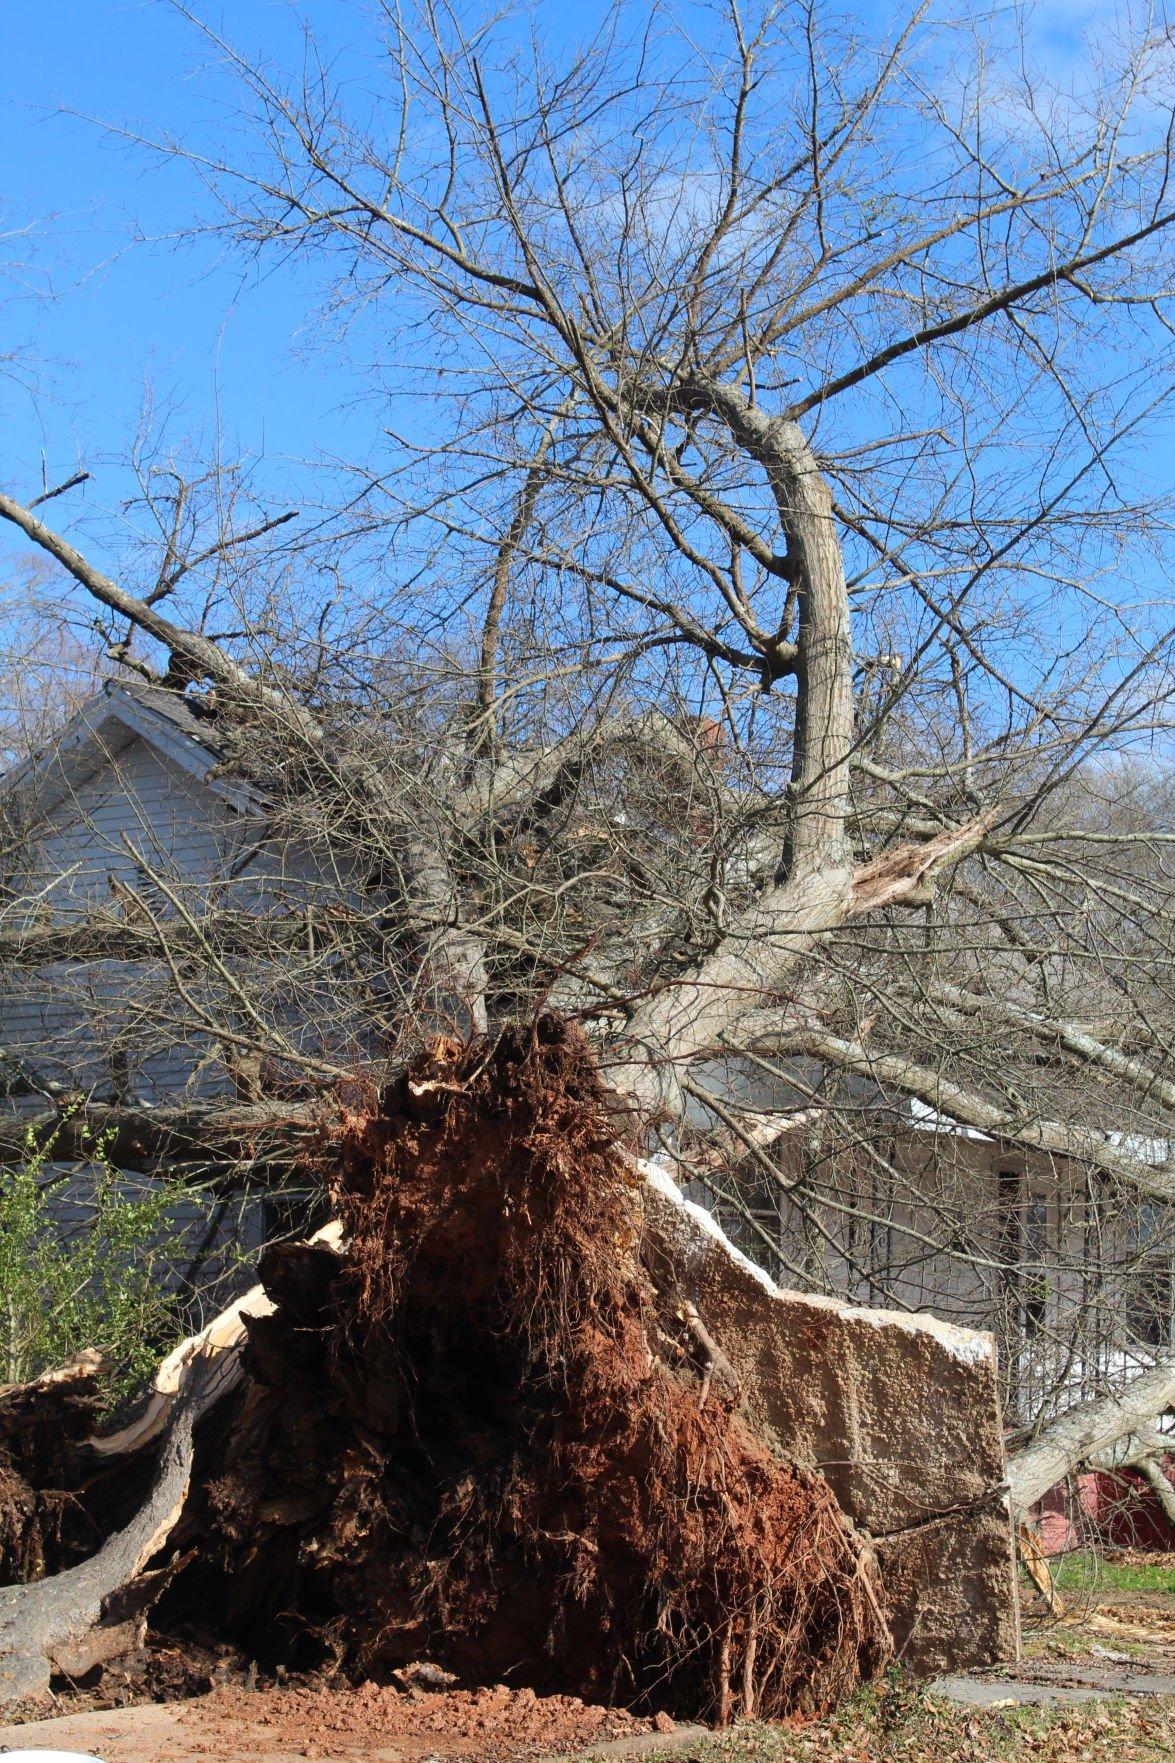 Southern part of Laurens County bears brunt of storms   GoClinton.com    golaurens.com